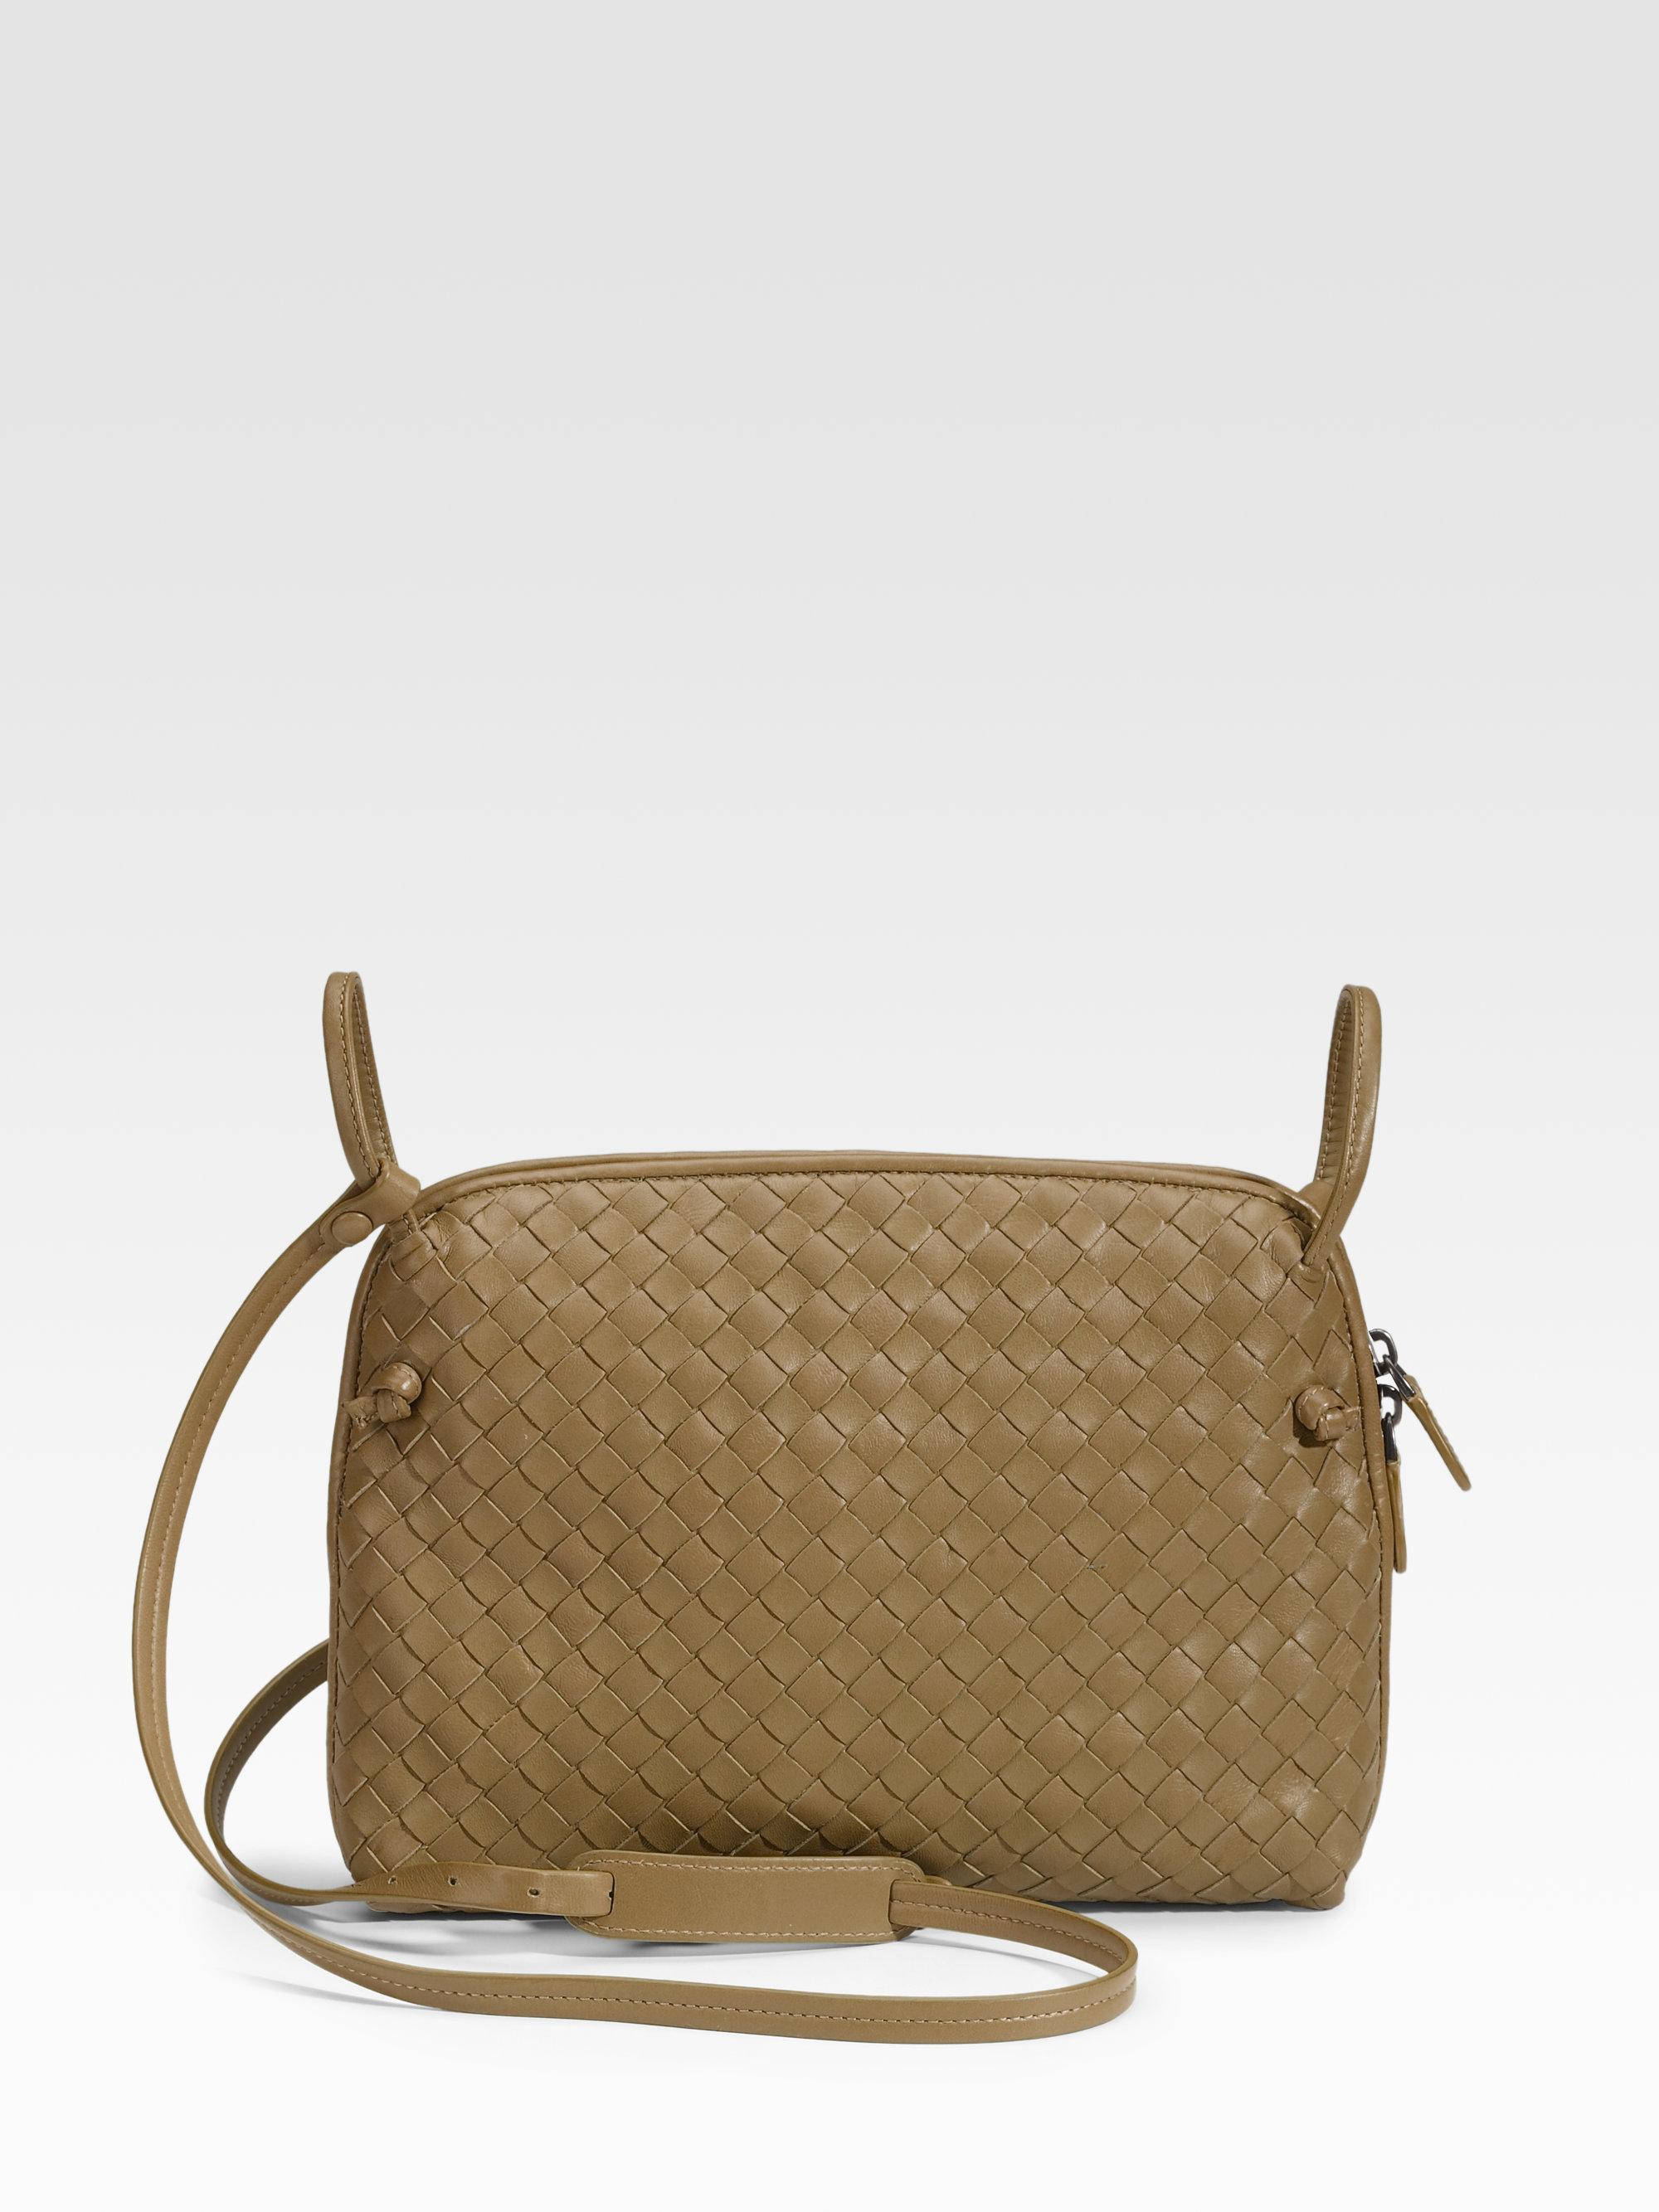 e34a1b102c19 Lyst - Bottega Veneta Small Leather Messenger Bag in Yellow